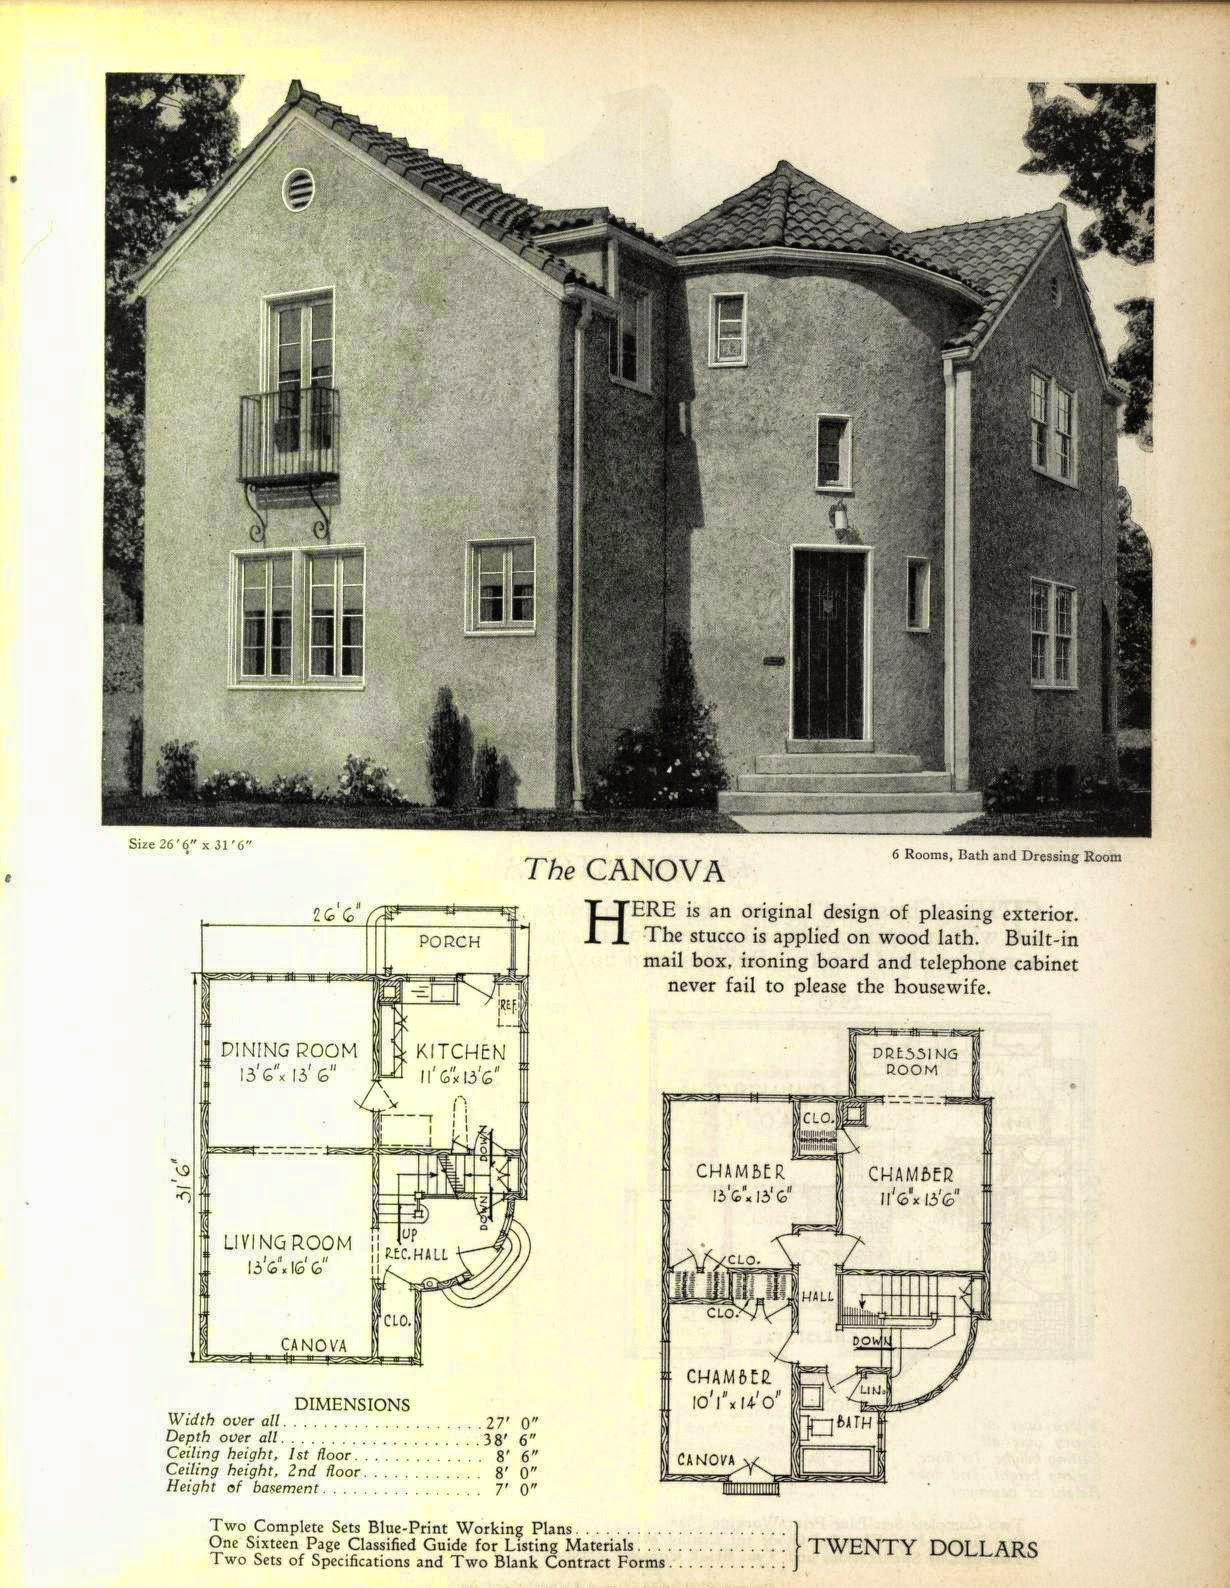 art deco house plans home design and style. Black Bedroom Furniture Sets. Home Design Ideas